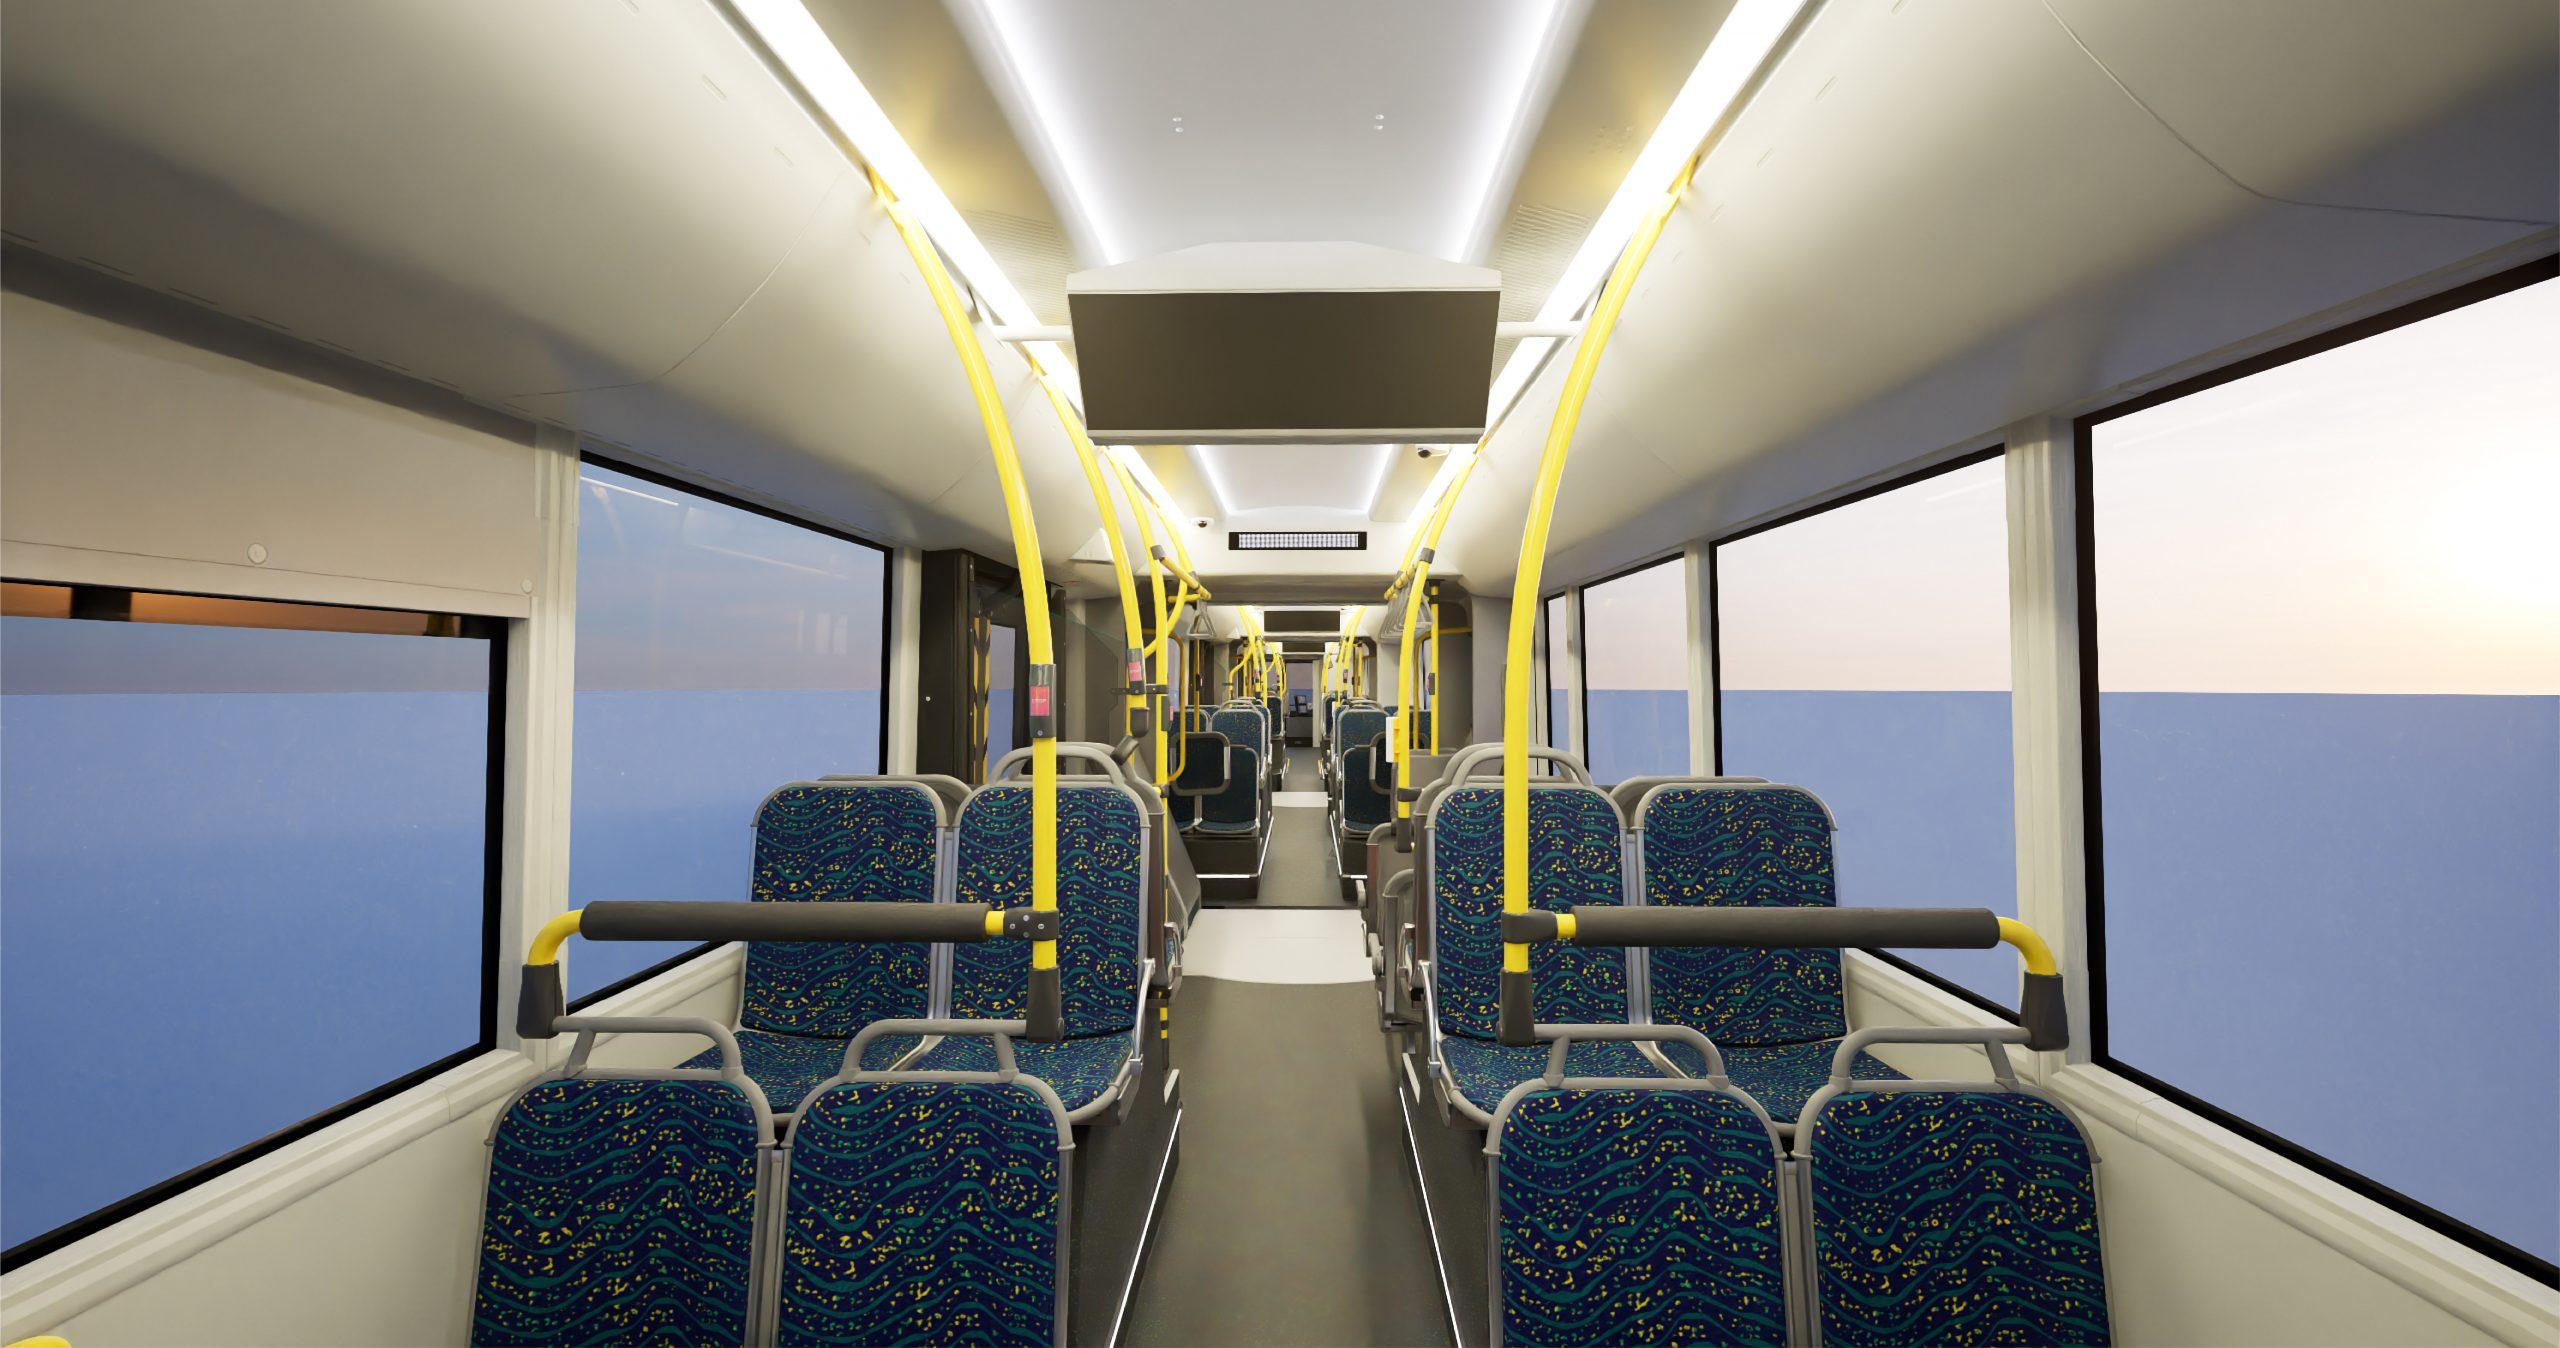 Brisbane Metro final design